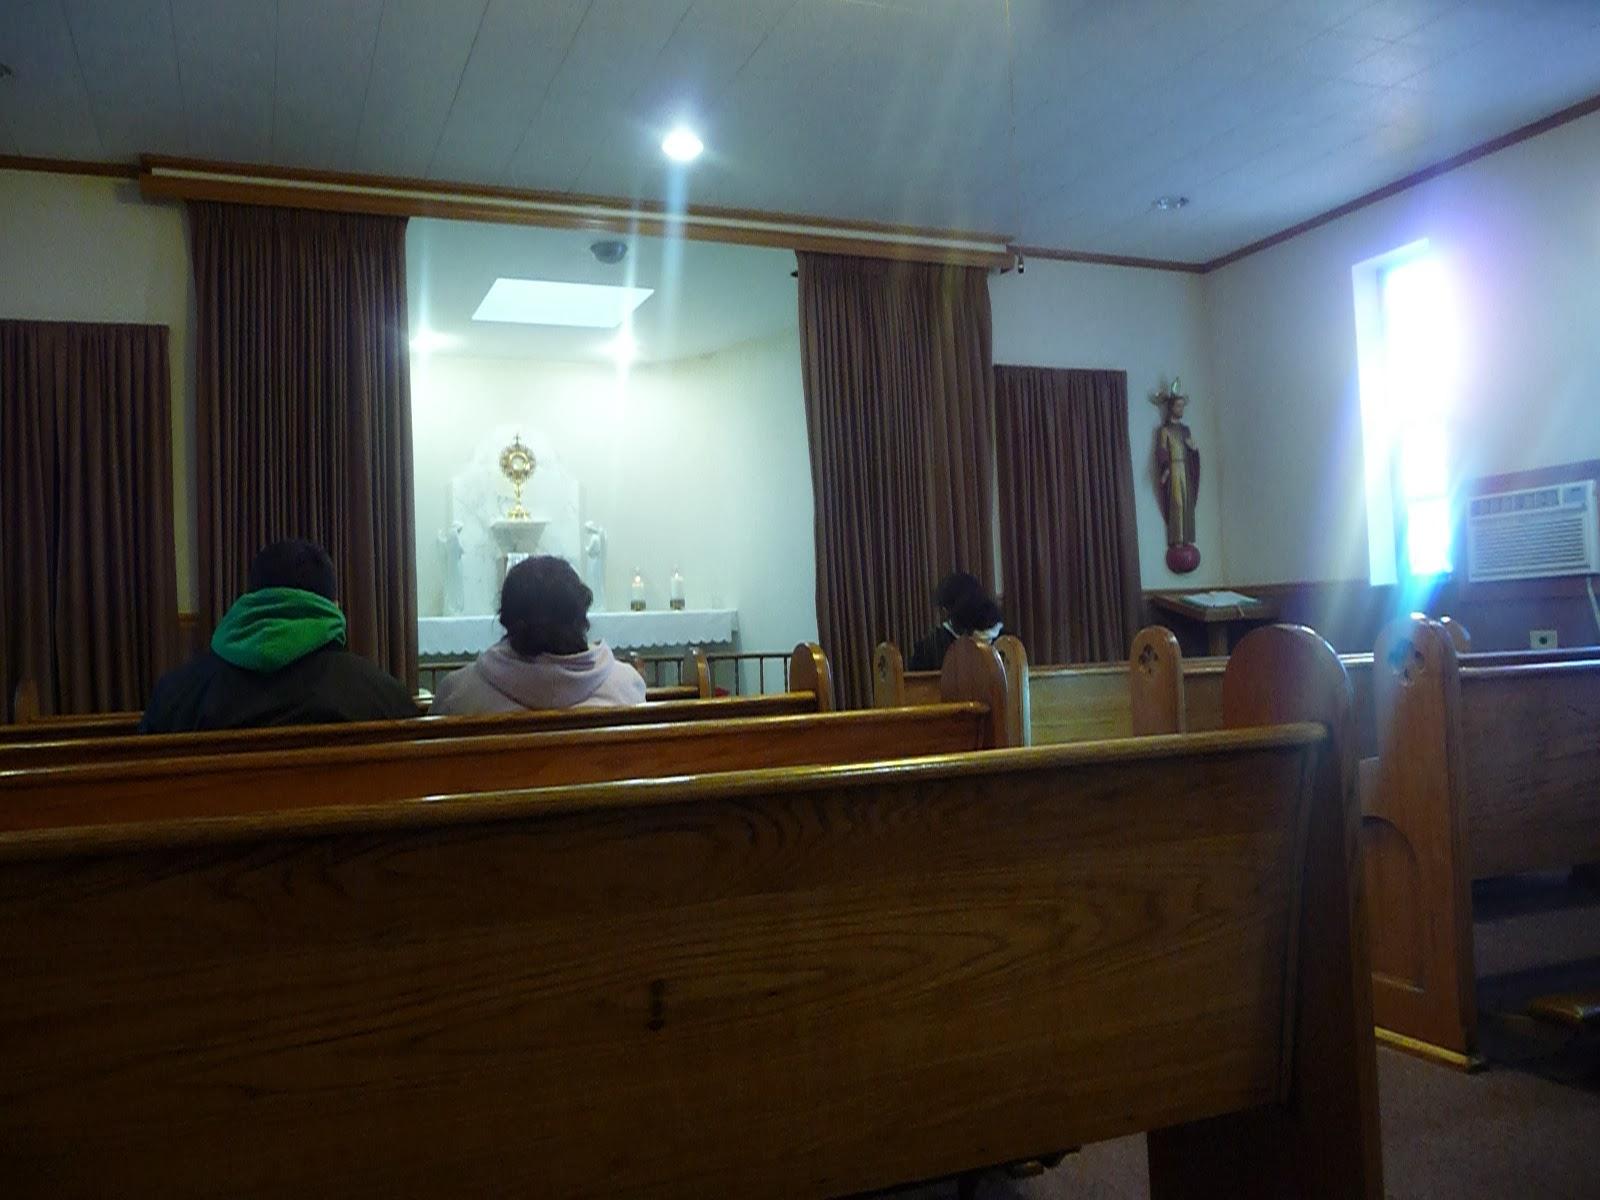 Perpetual Eucharistic adoration chapel, St. John Vianney, Northlake, IL